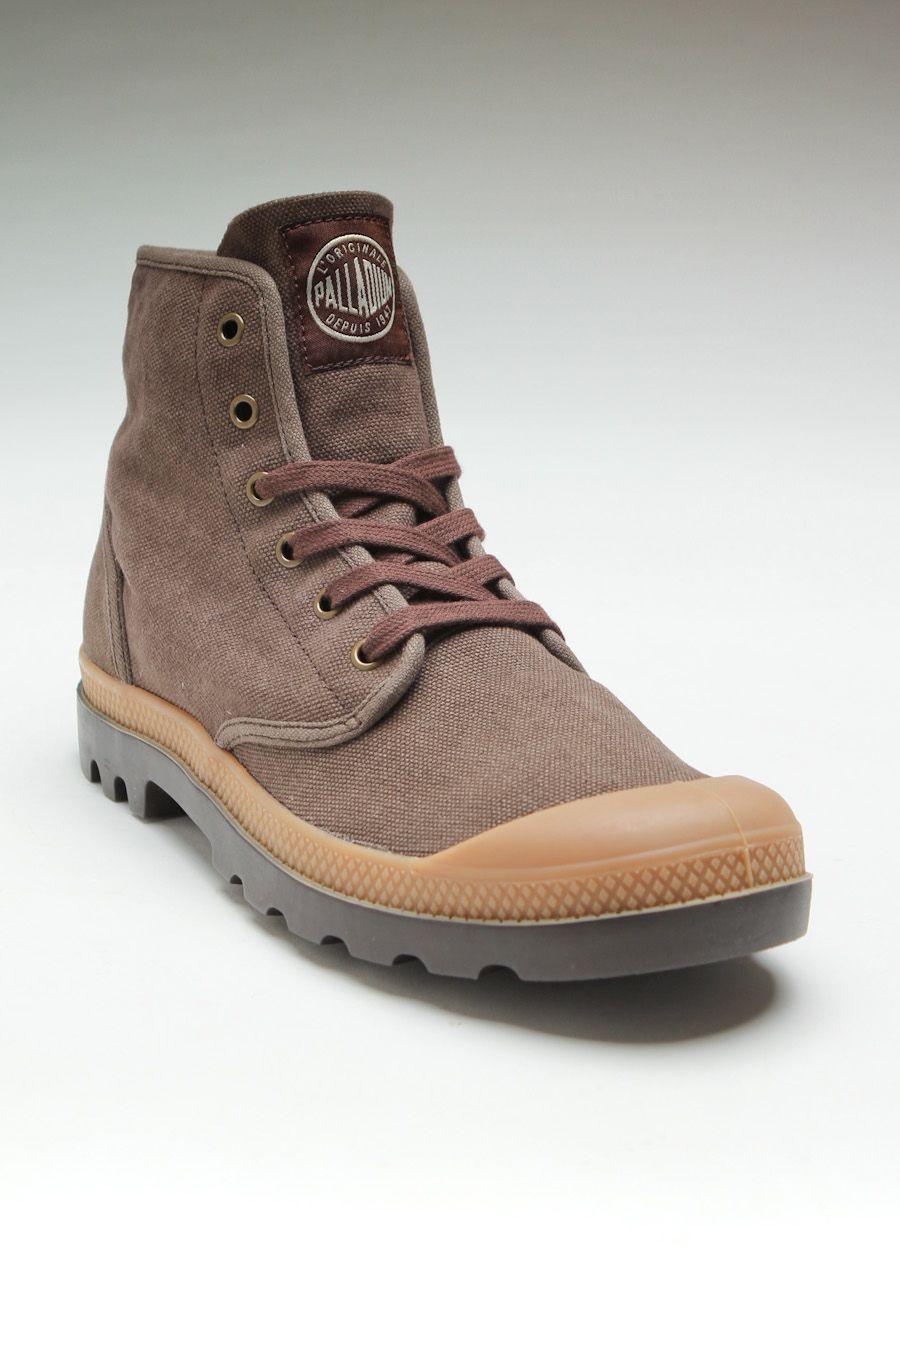 1cc84b6be0 Palladium Pampa Hi Chestnut/Putty | Casual Man | Palladium boots ...